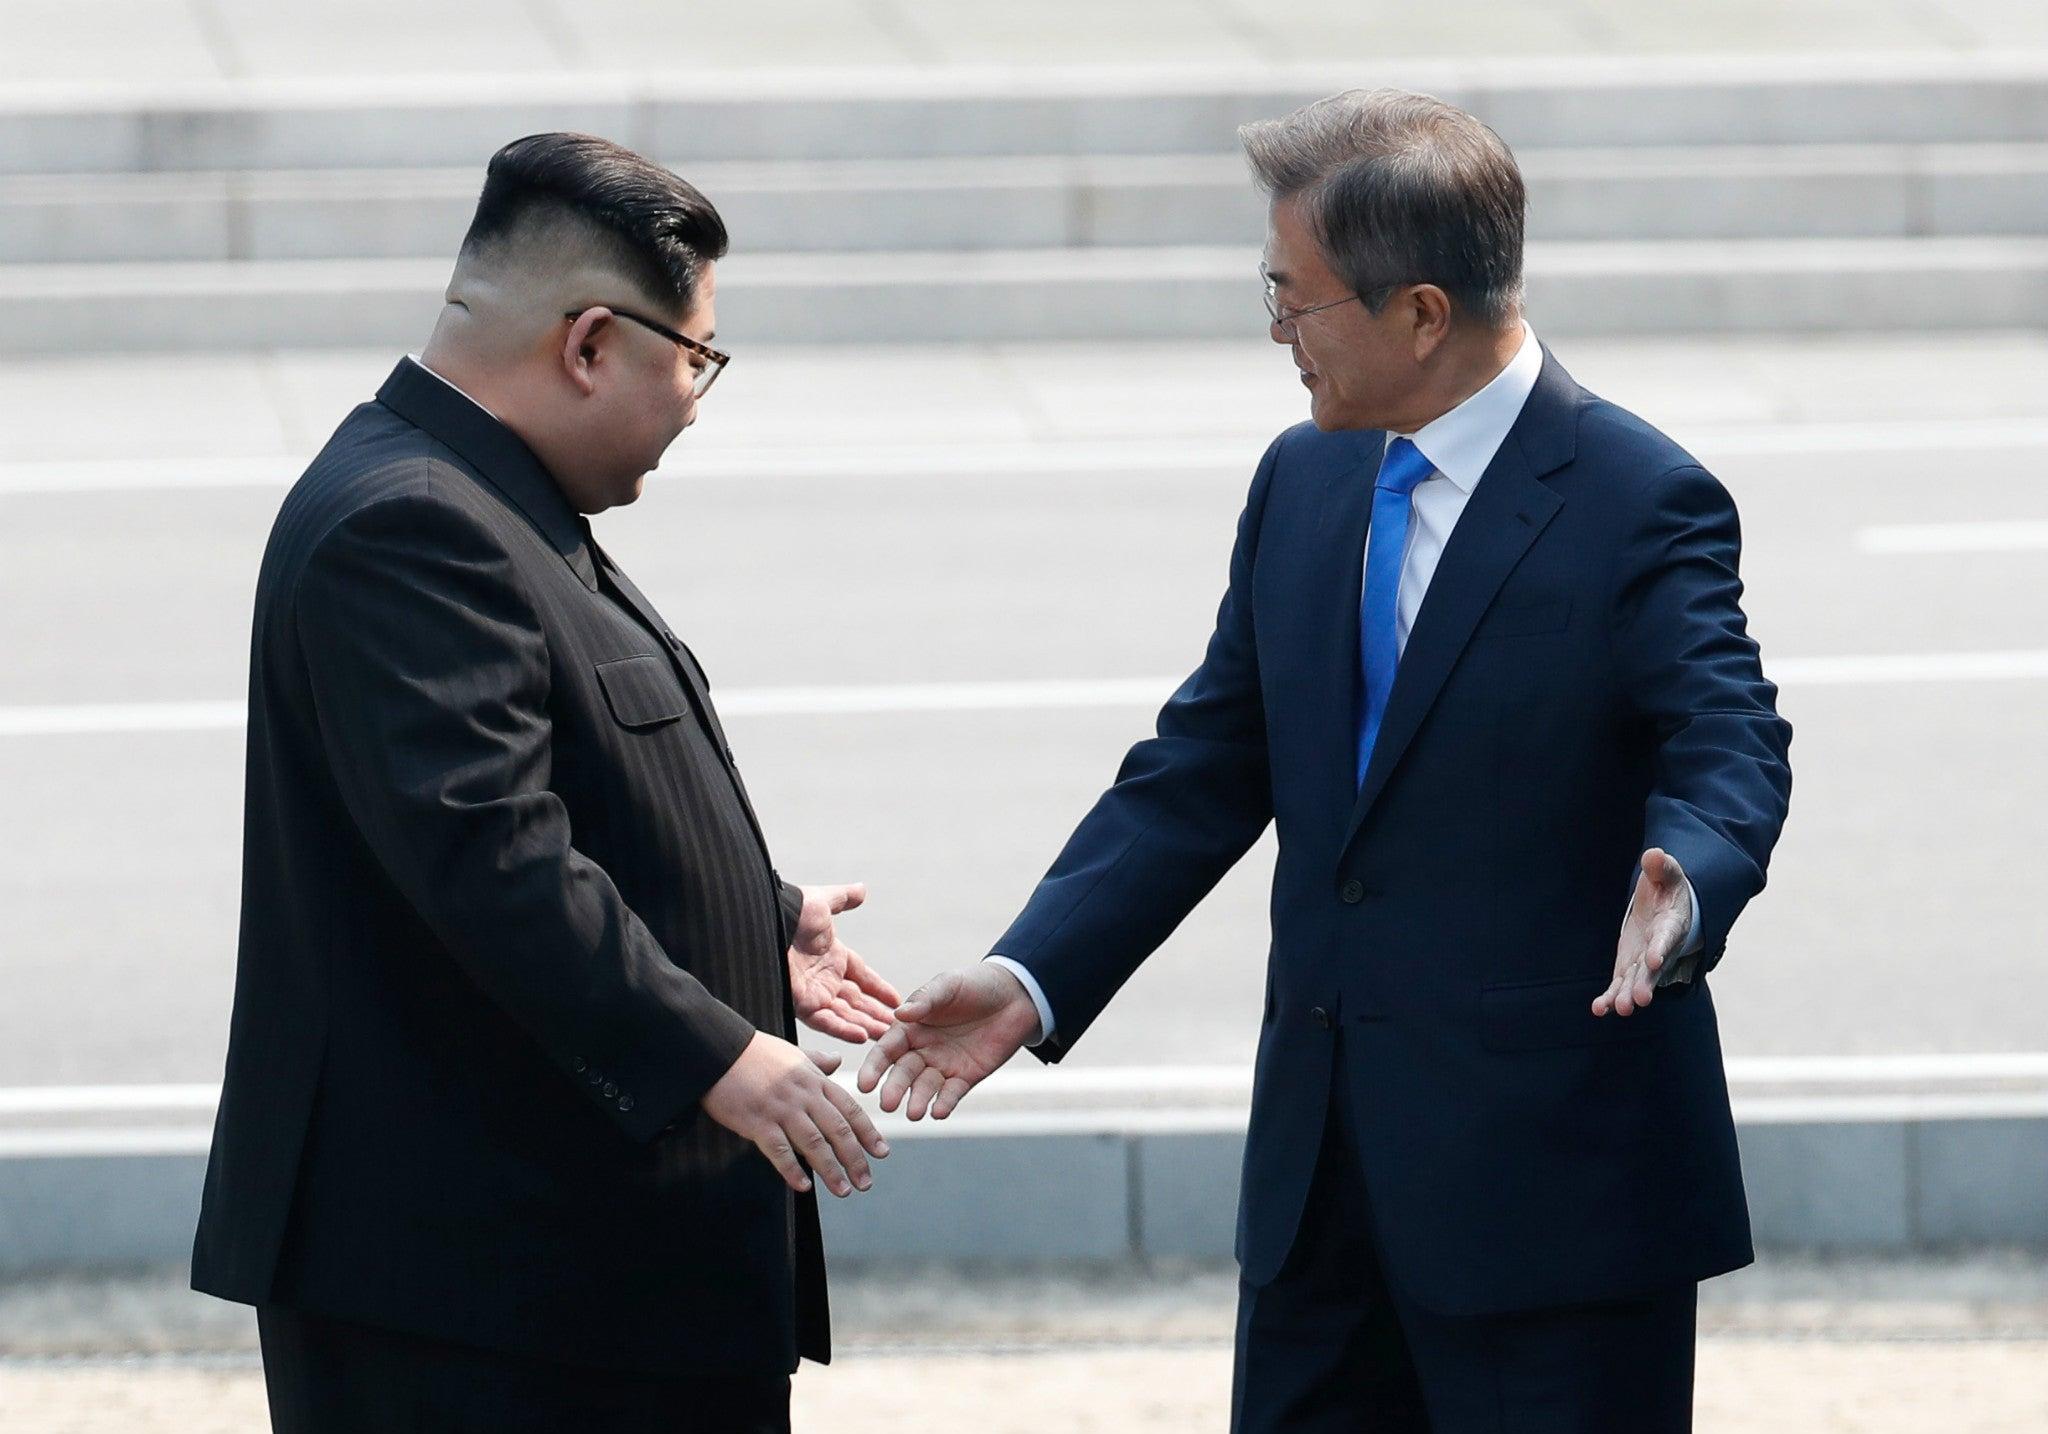 Korea Summit: Kim Jong-un crosses into South Korea for historic meeting